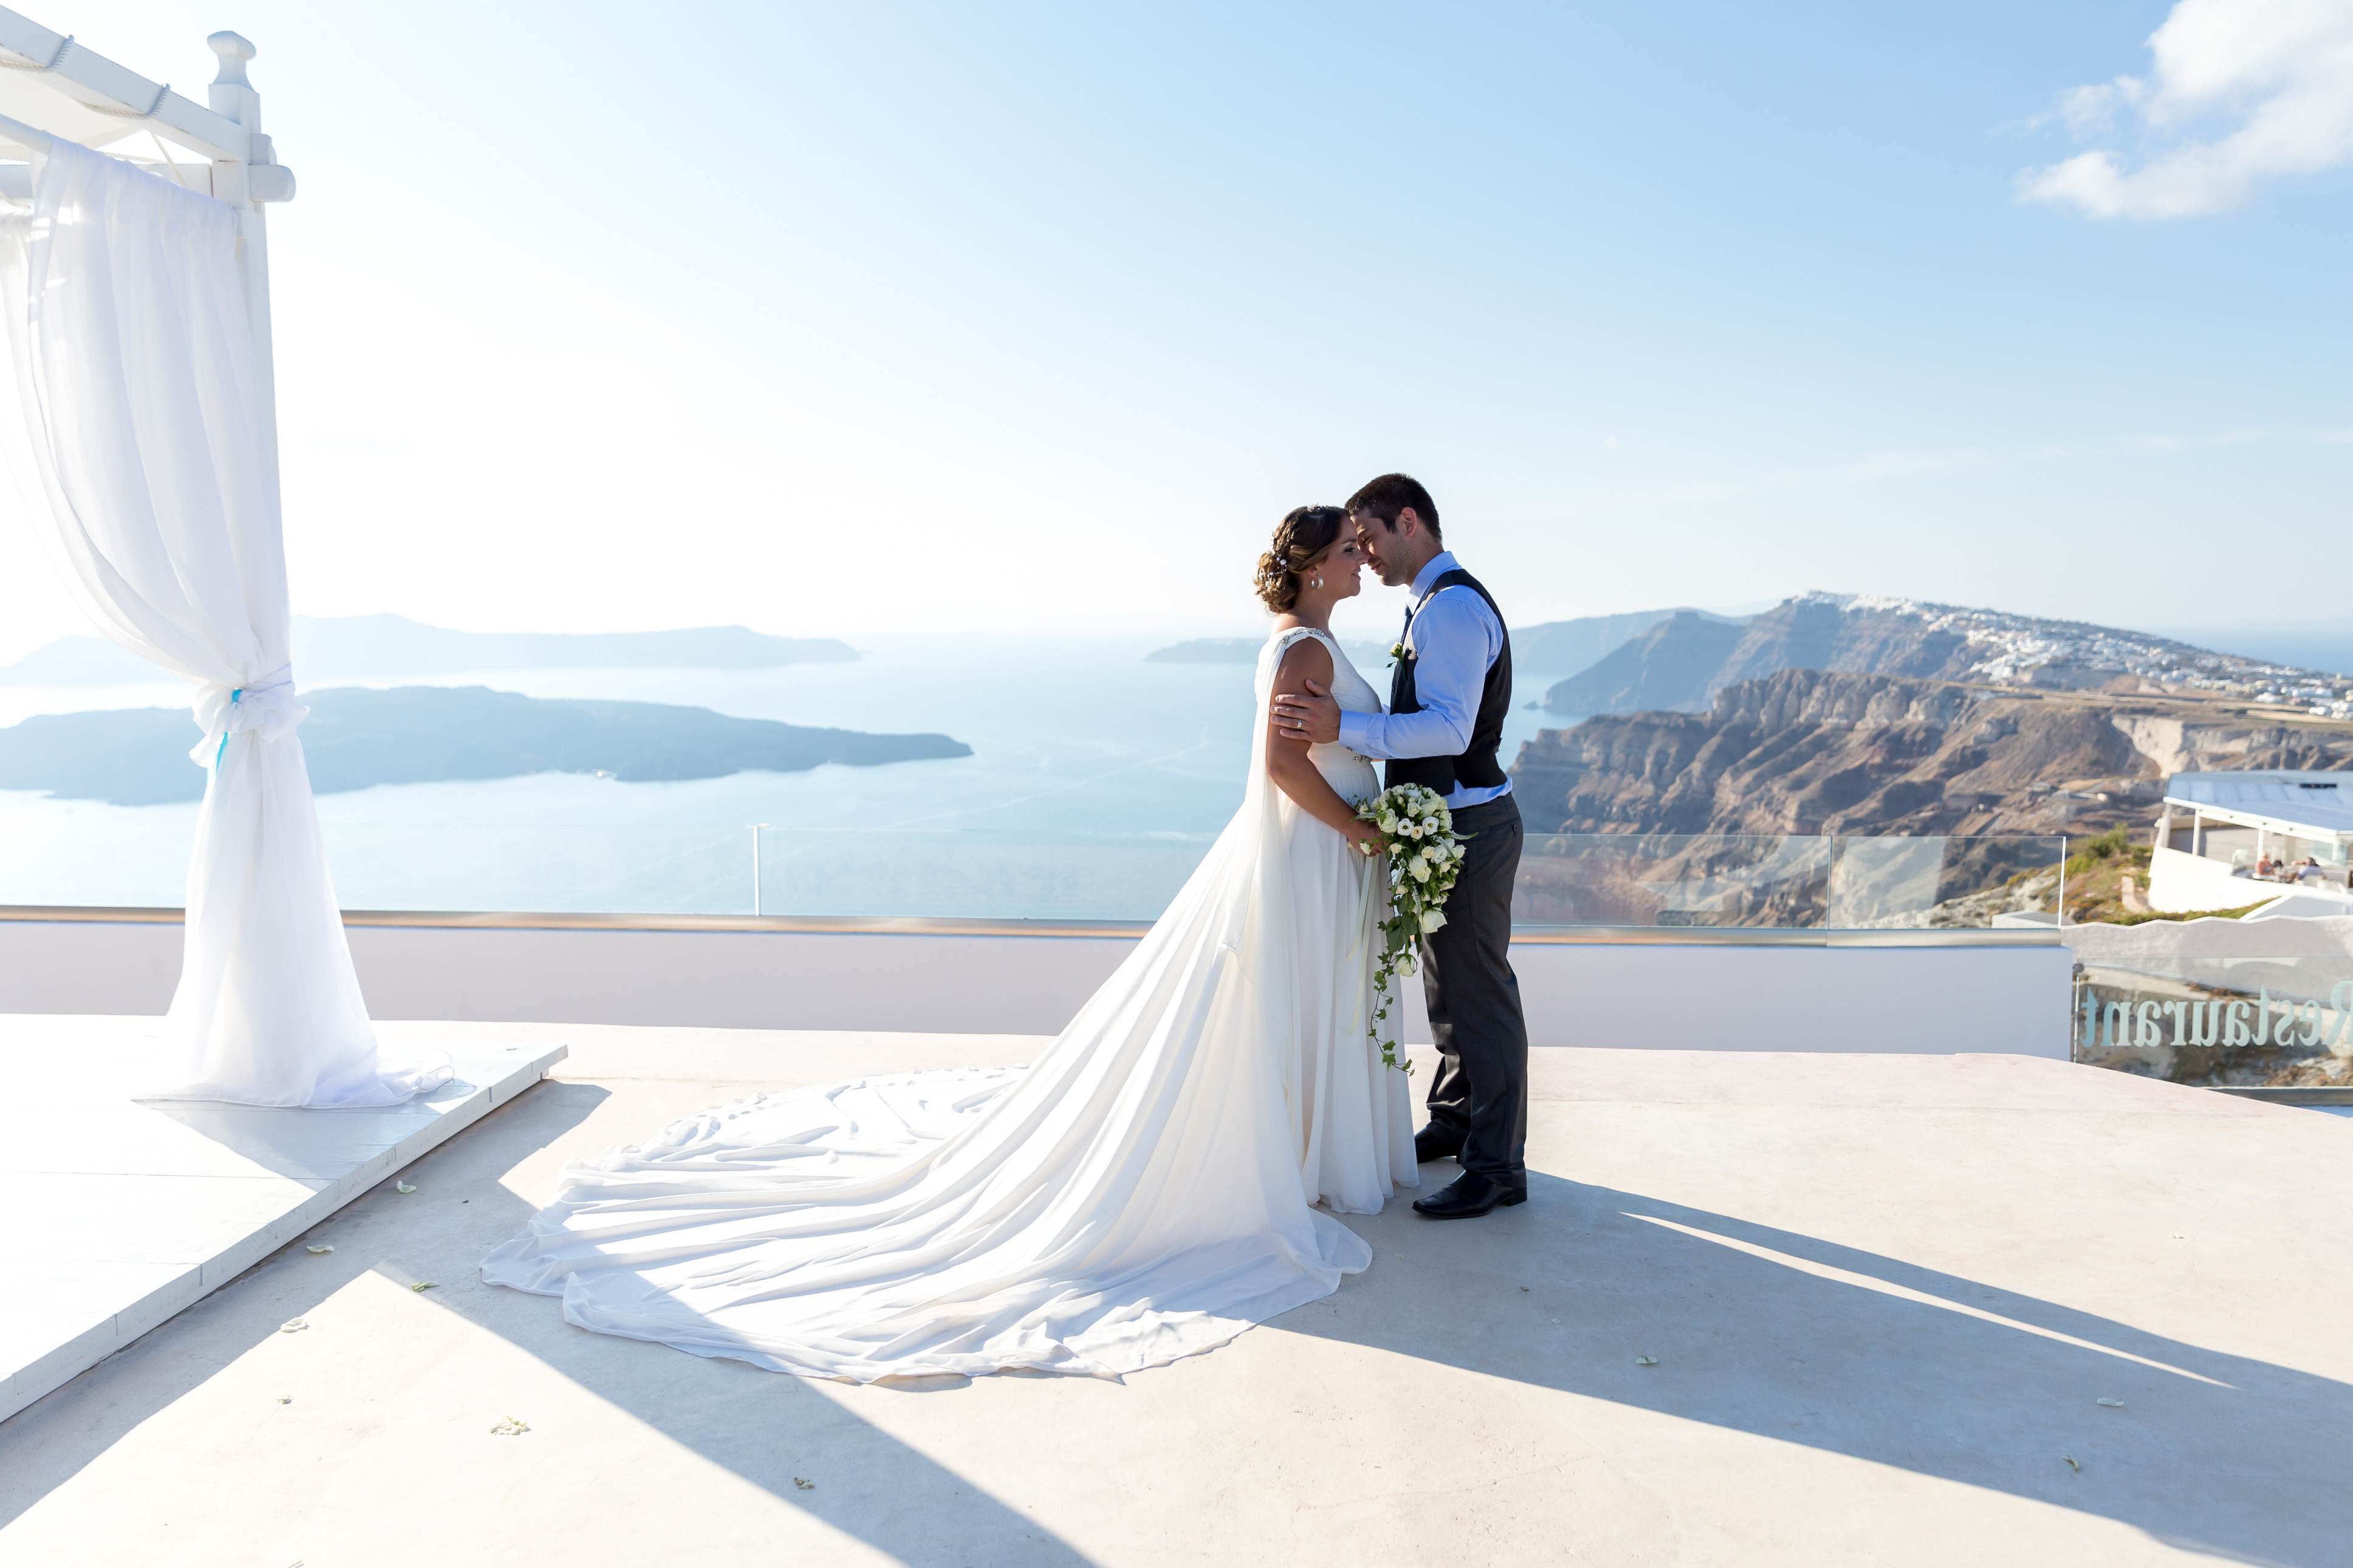 Planet Holidays Weddings